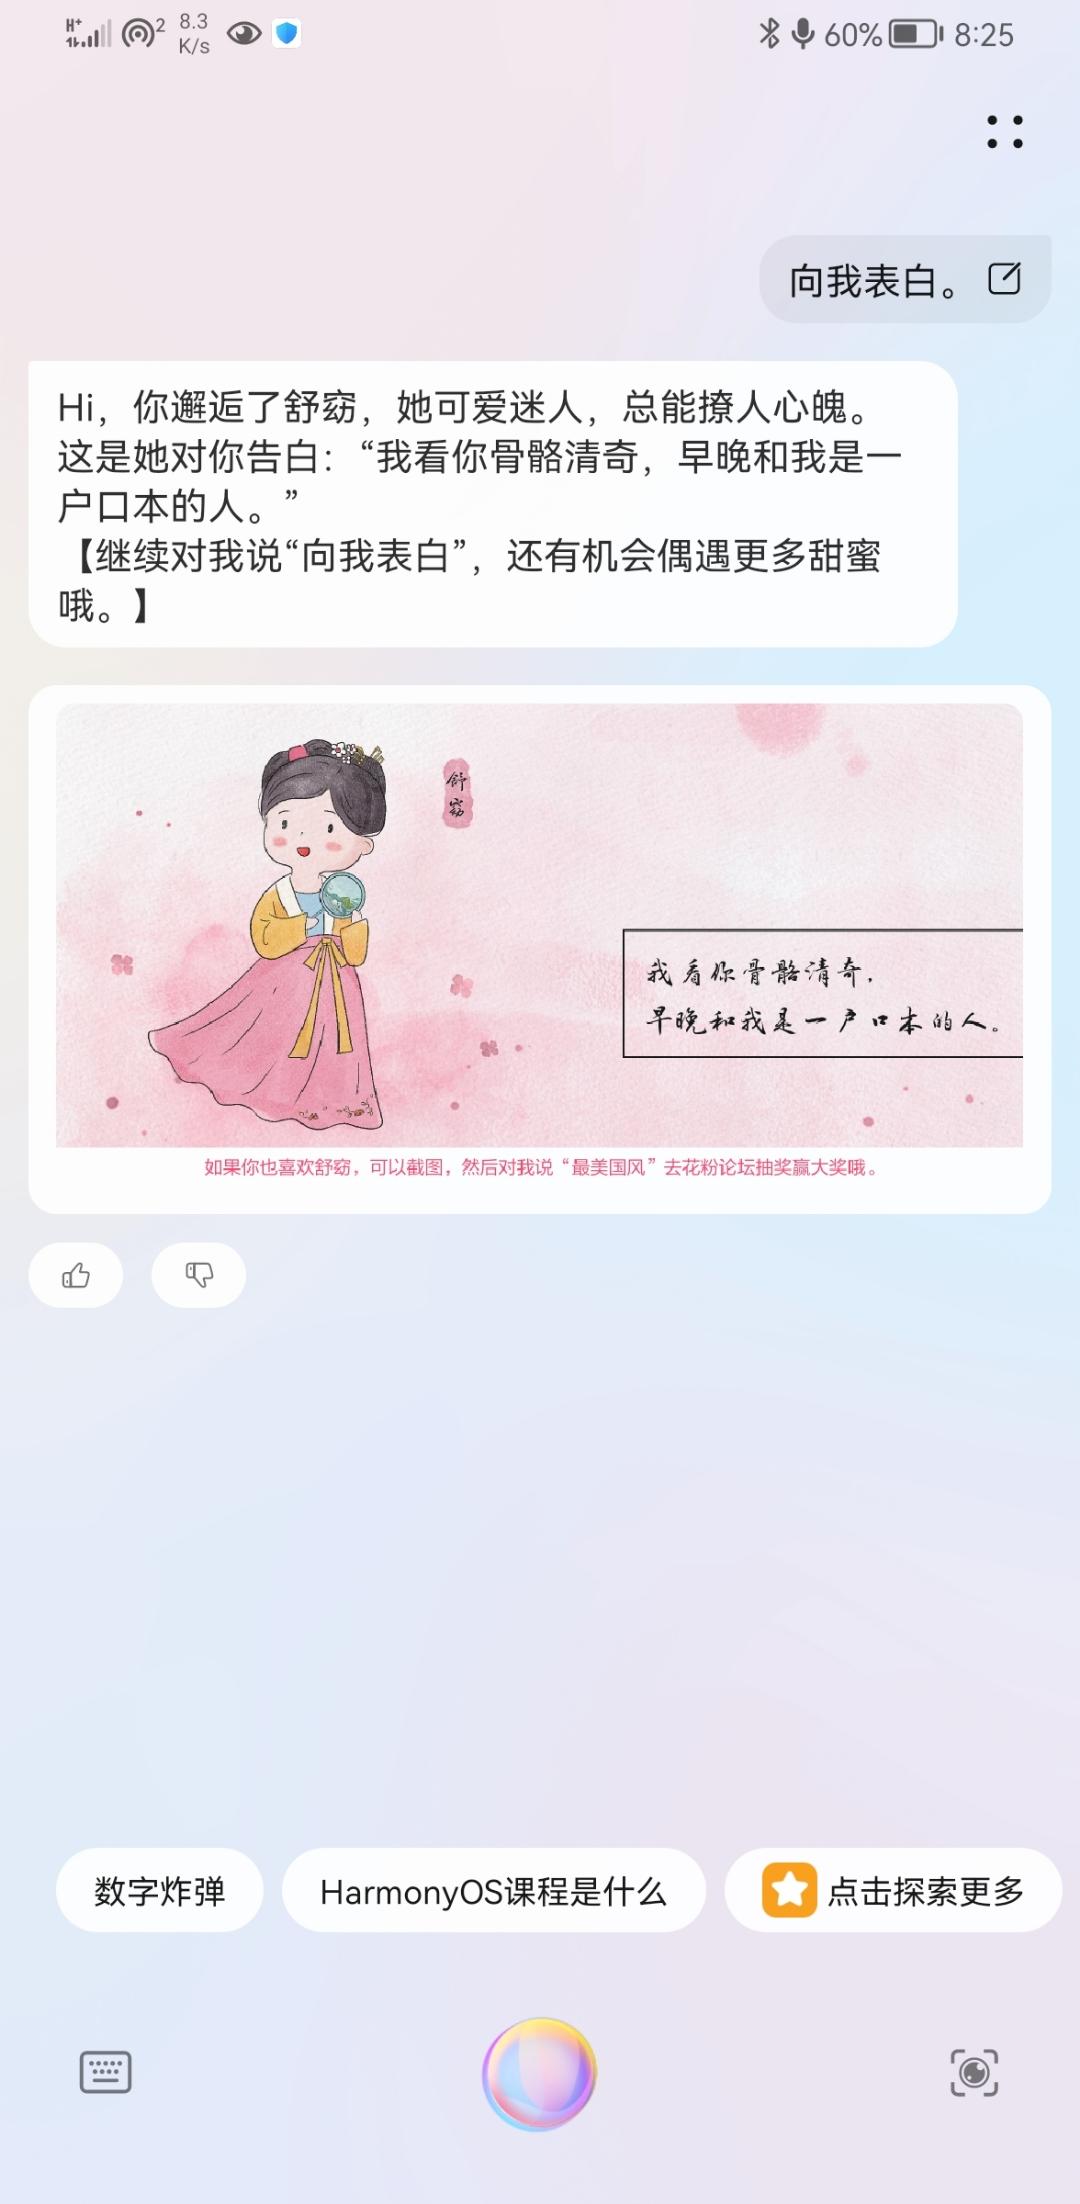 Screenshot_20210611_202555_com.huawei.vassistant.jpg